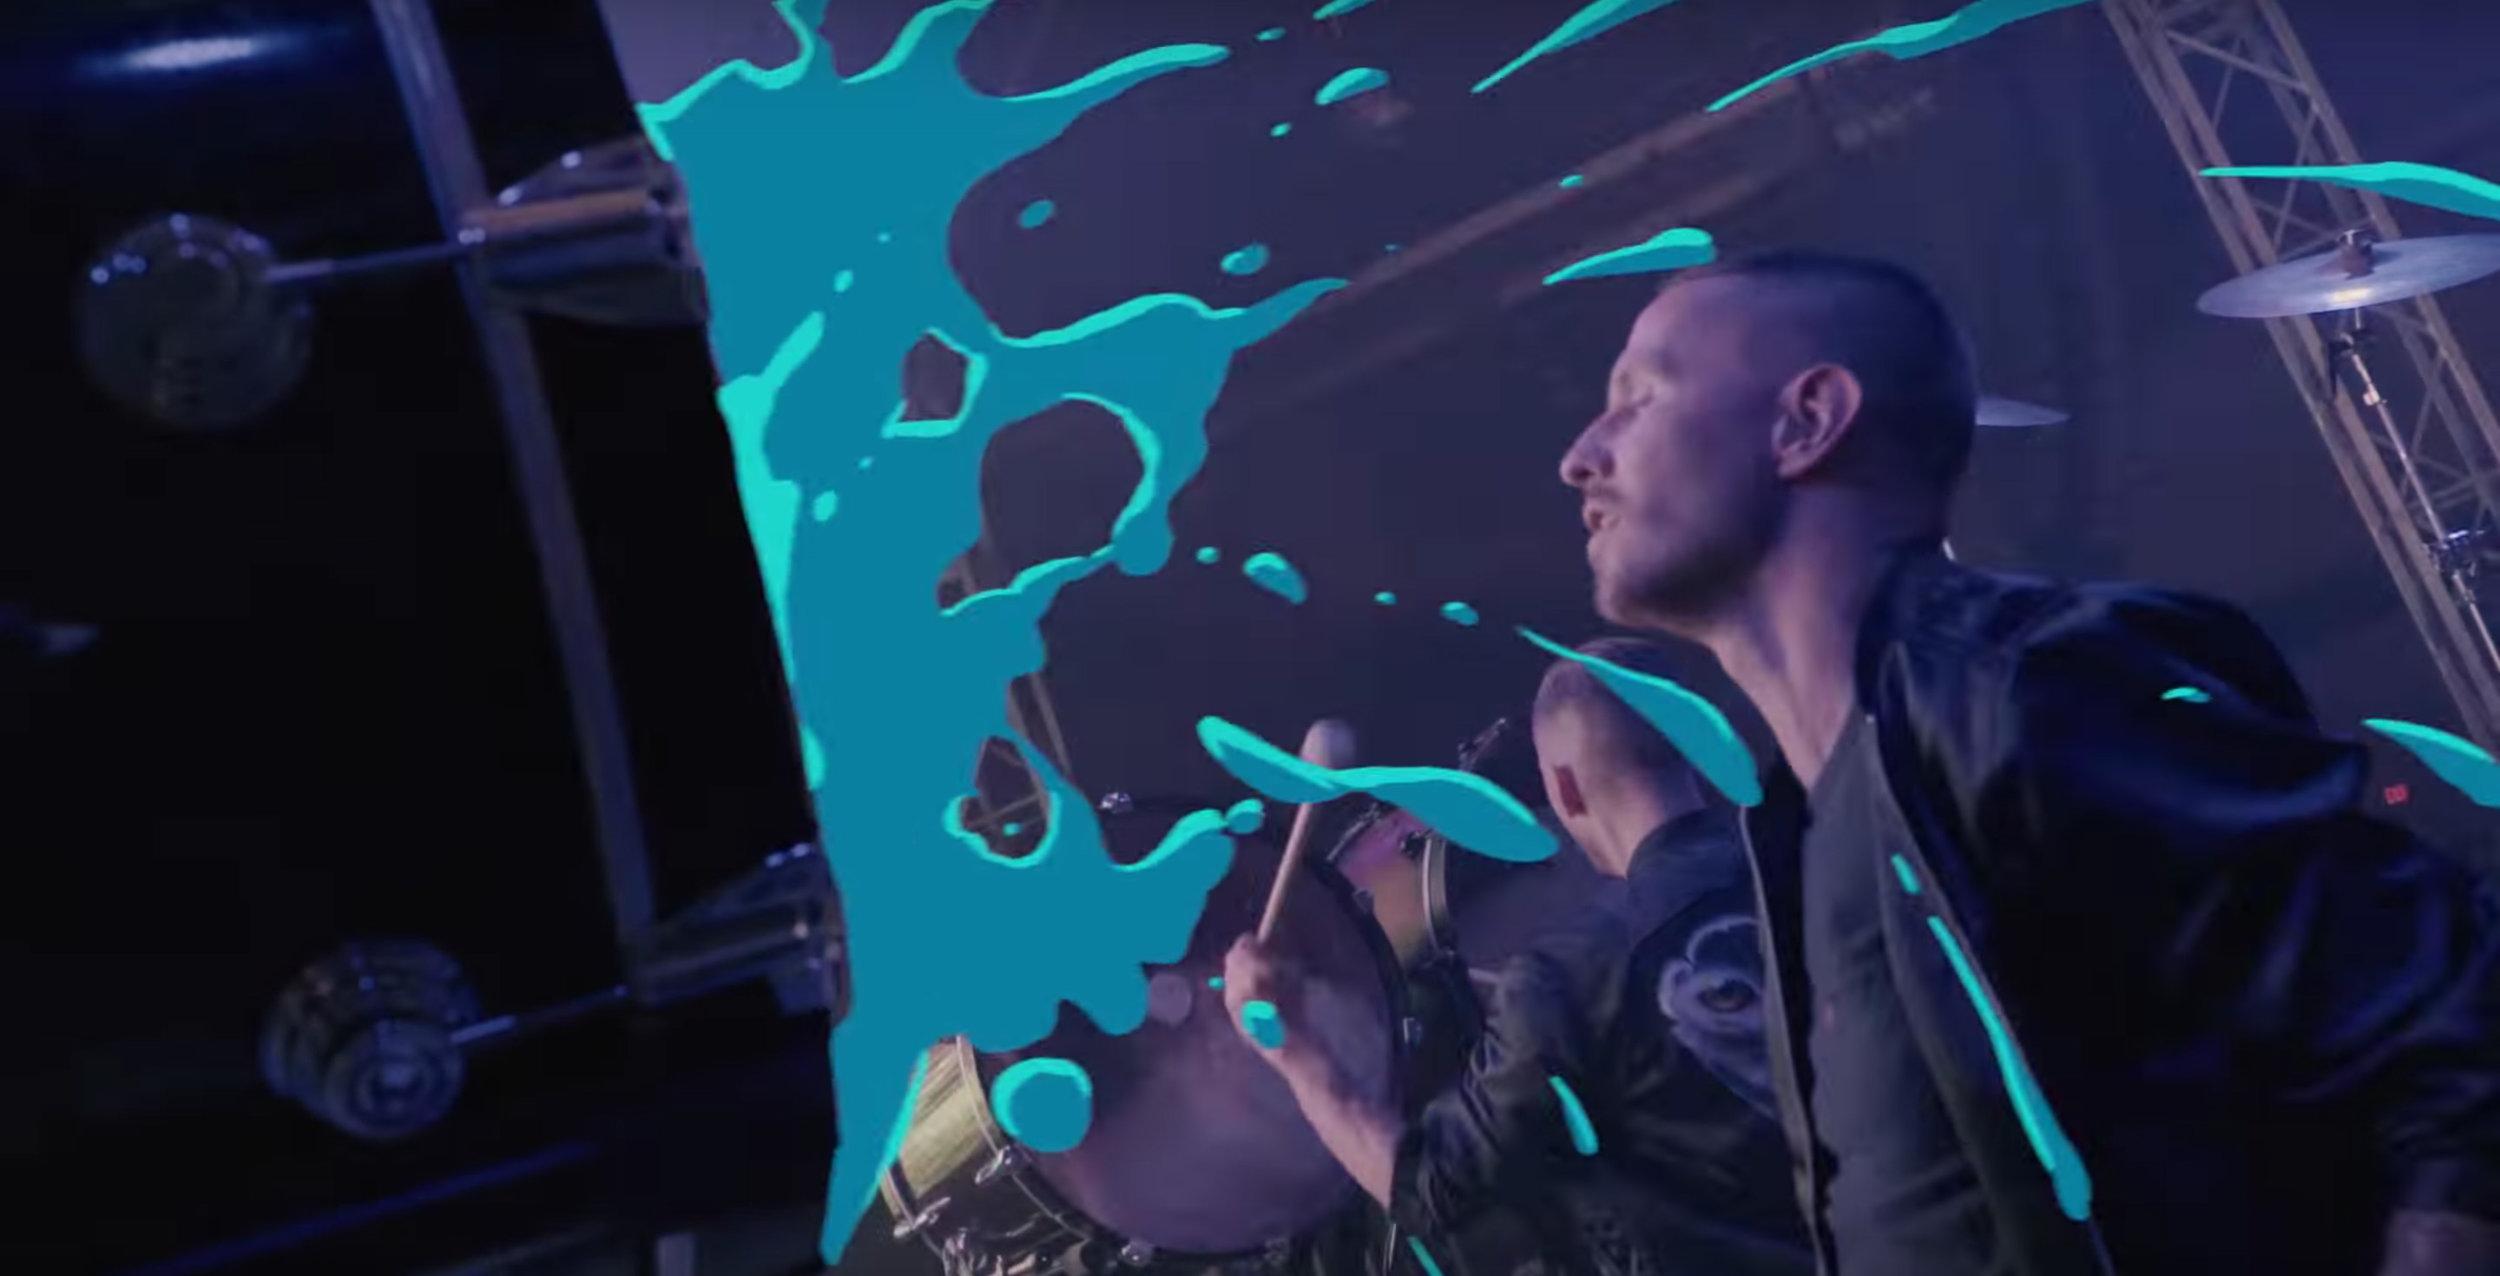 Galantis: Pillow Fight - music video